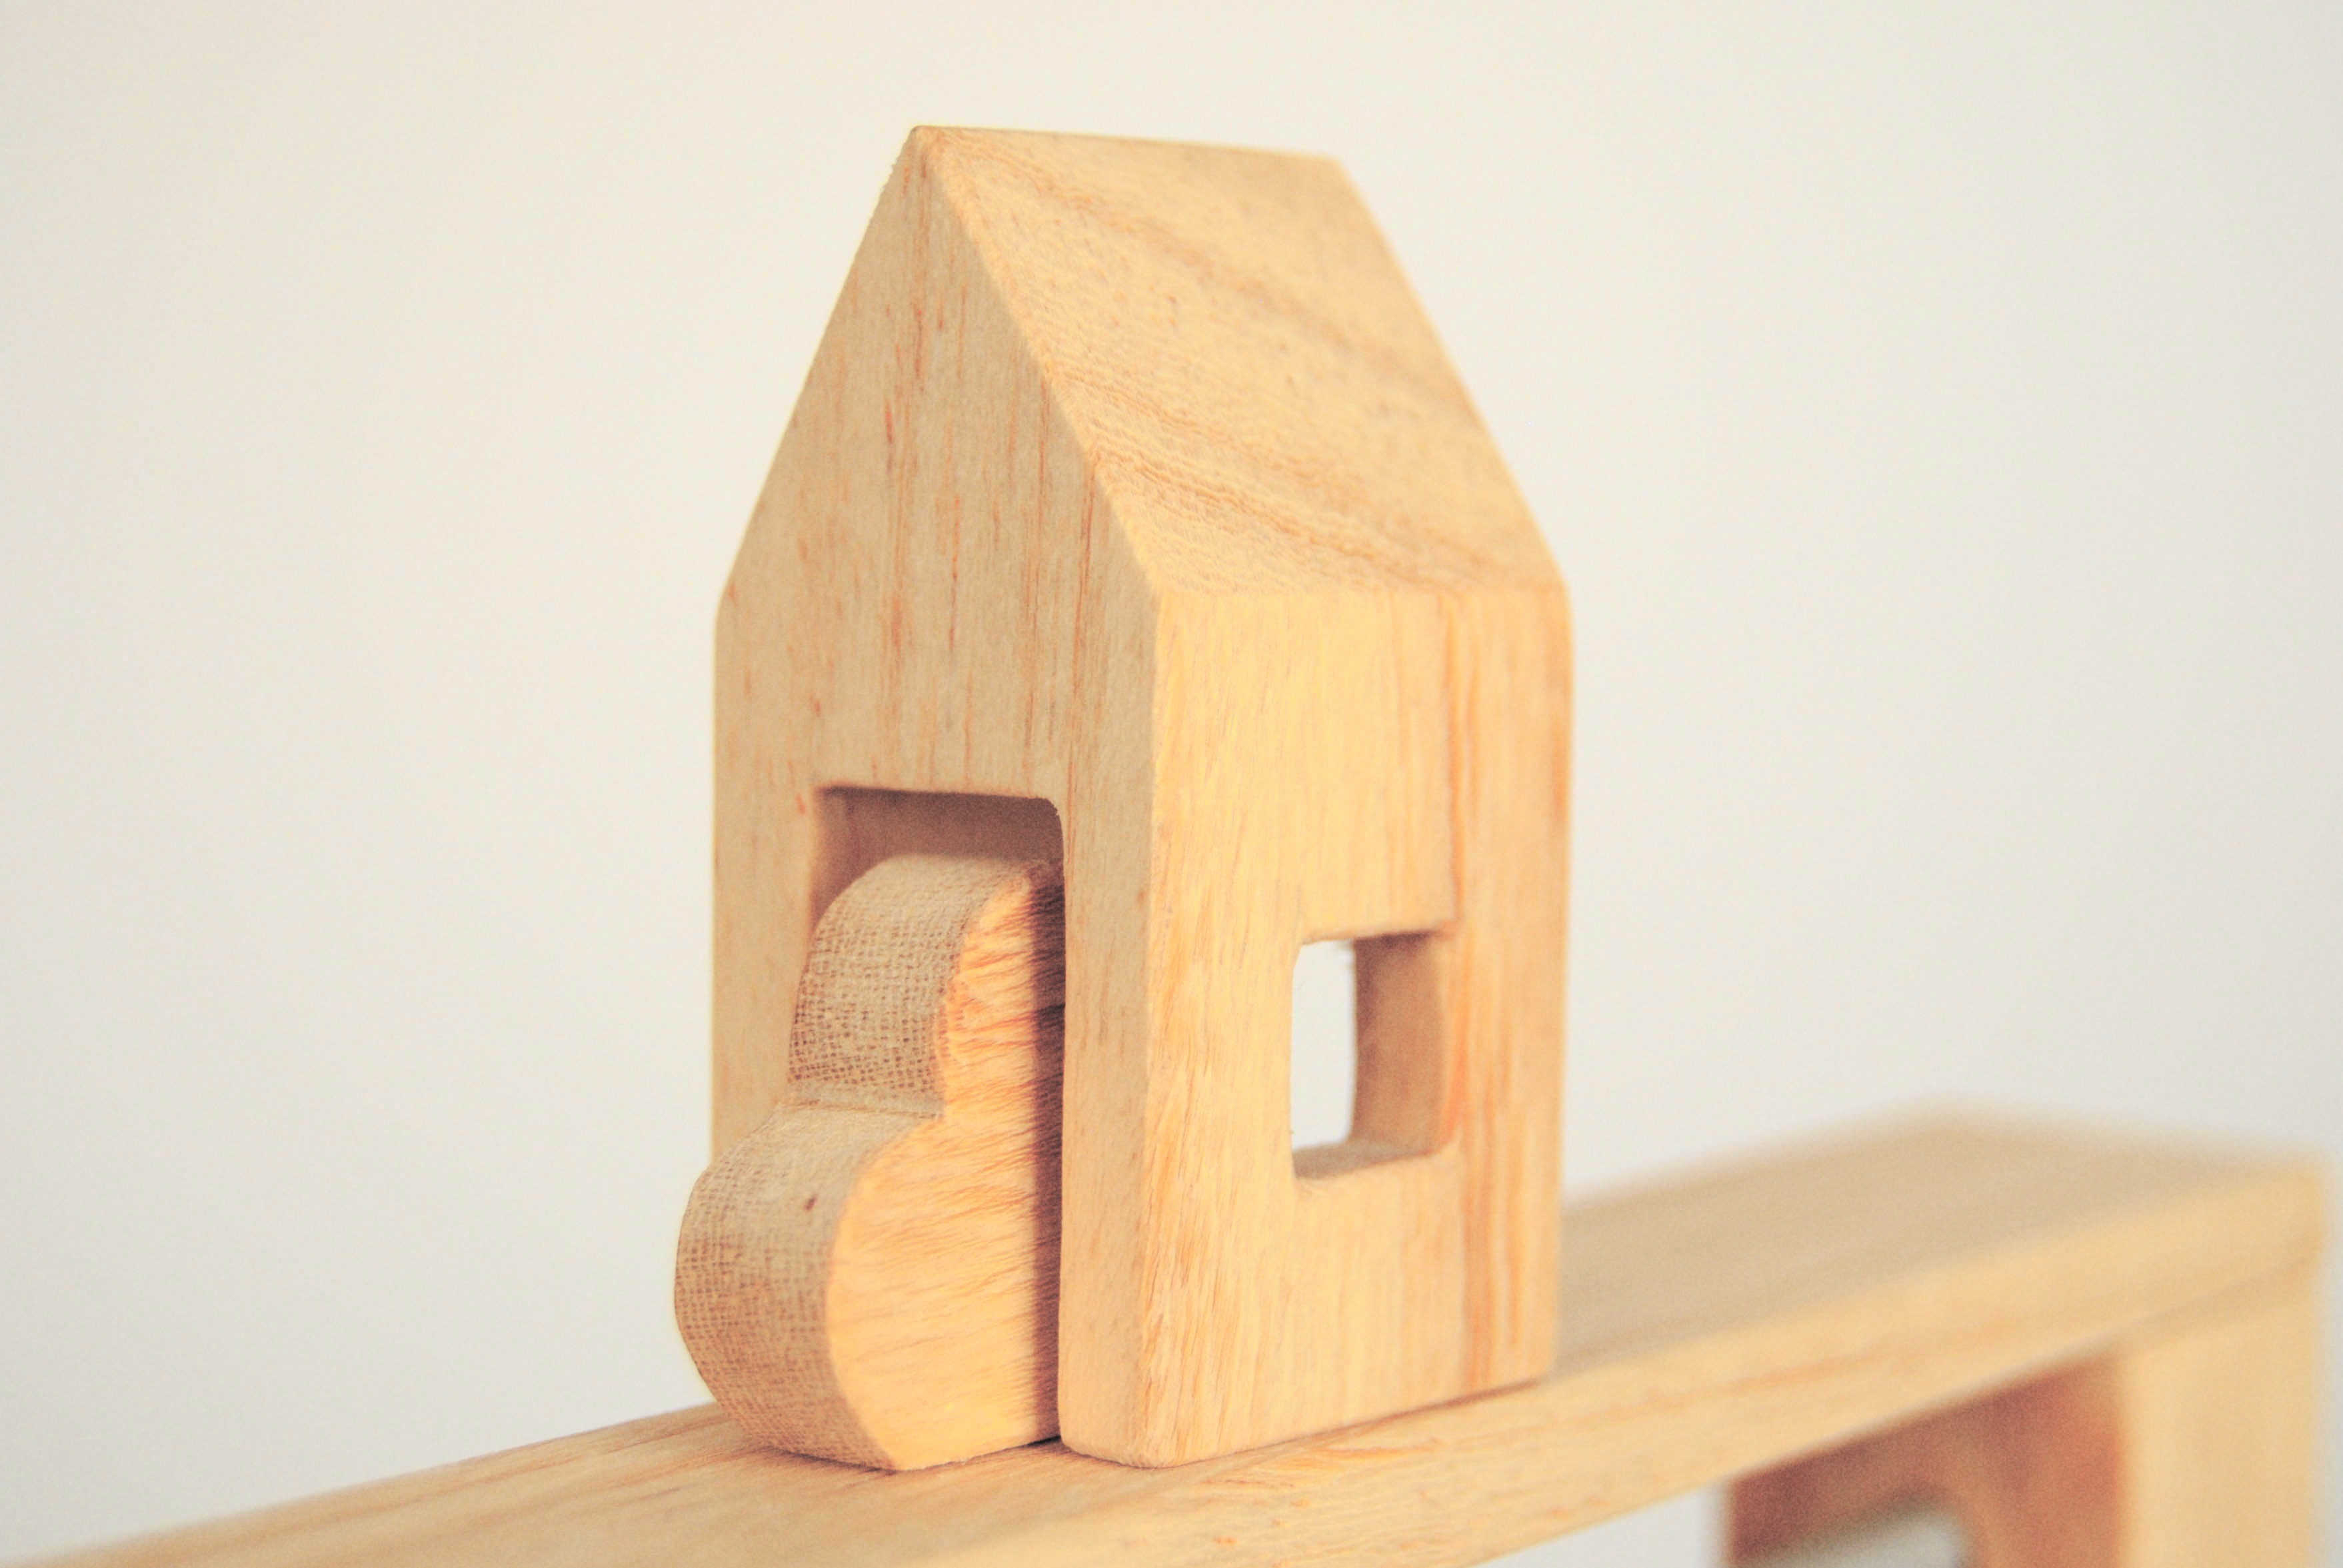 leonardo da vinci magnetic wooden toys